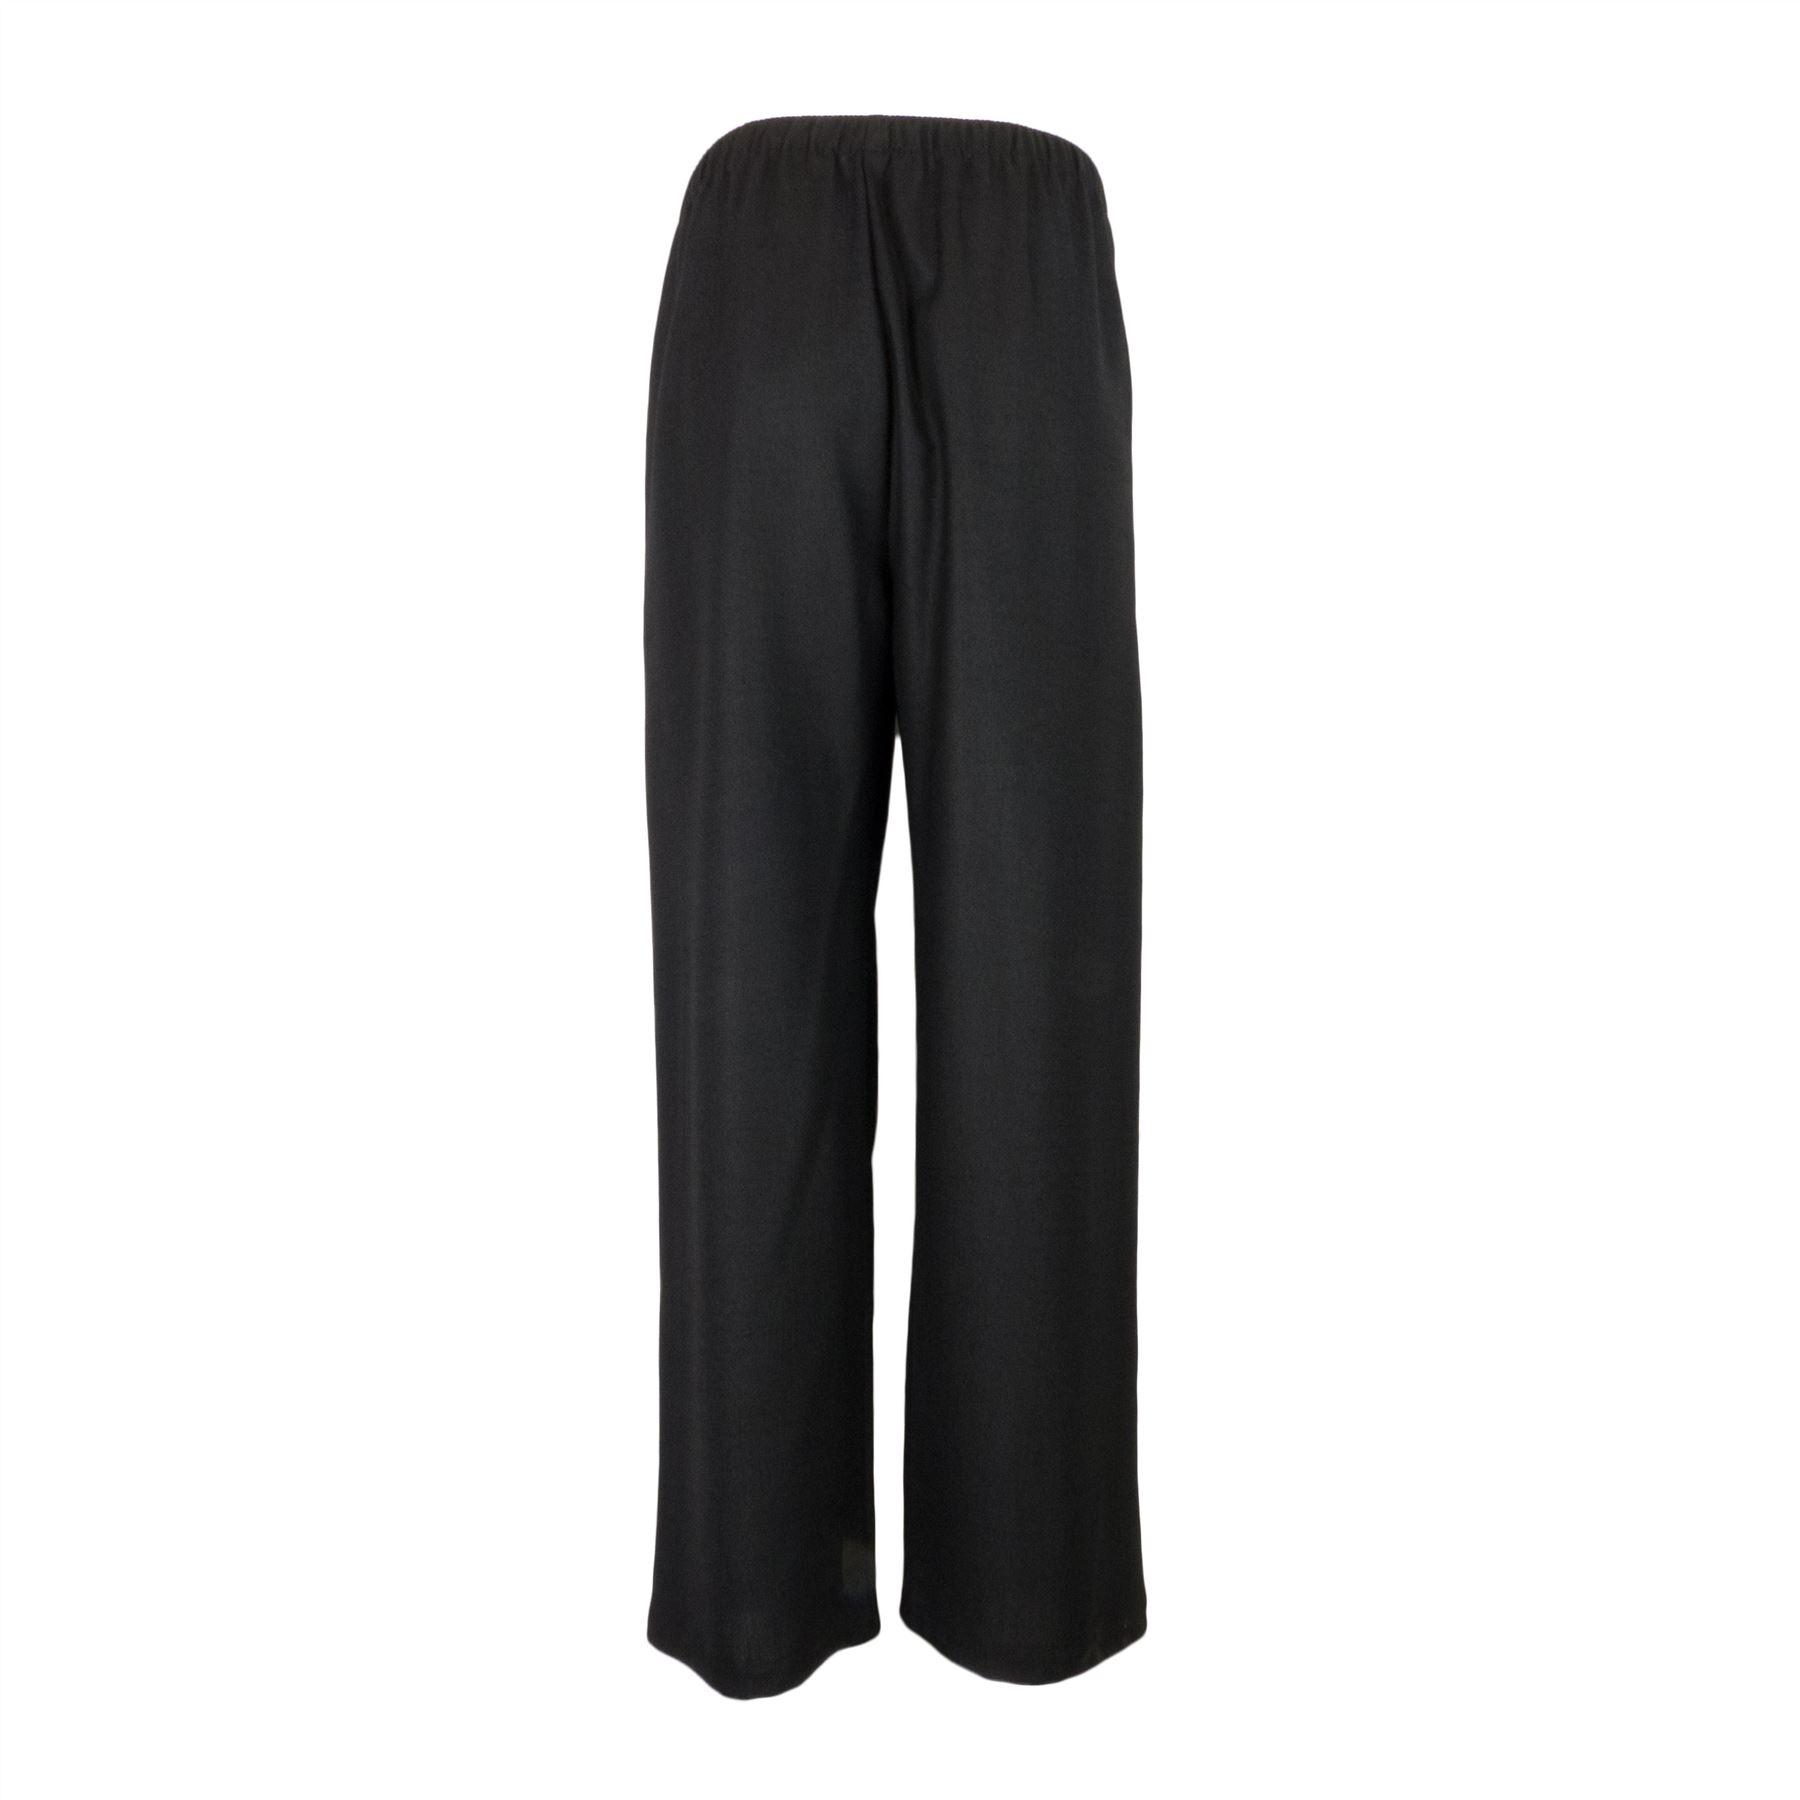 Saloos-Linen-Look-Trouser-Casual-or-Eveningwear-Elasticated-Waist thumbnail 7